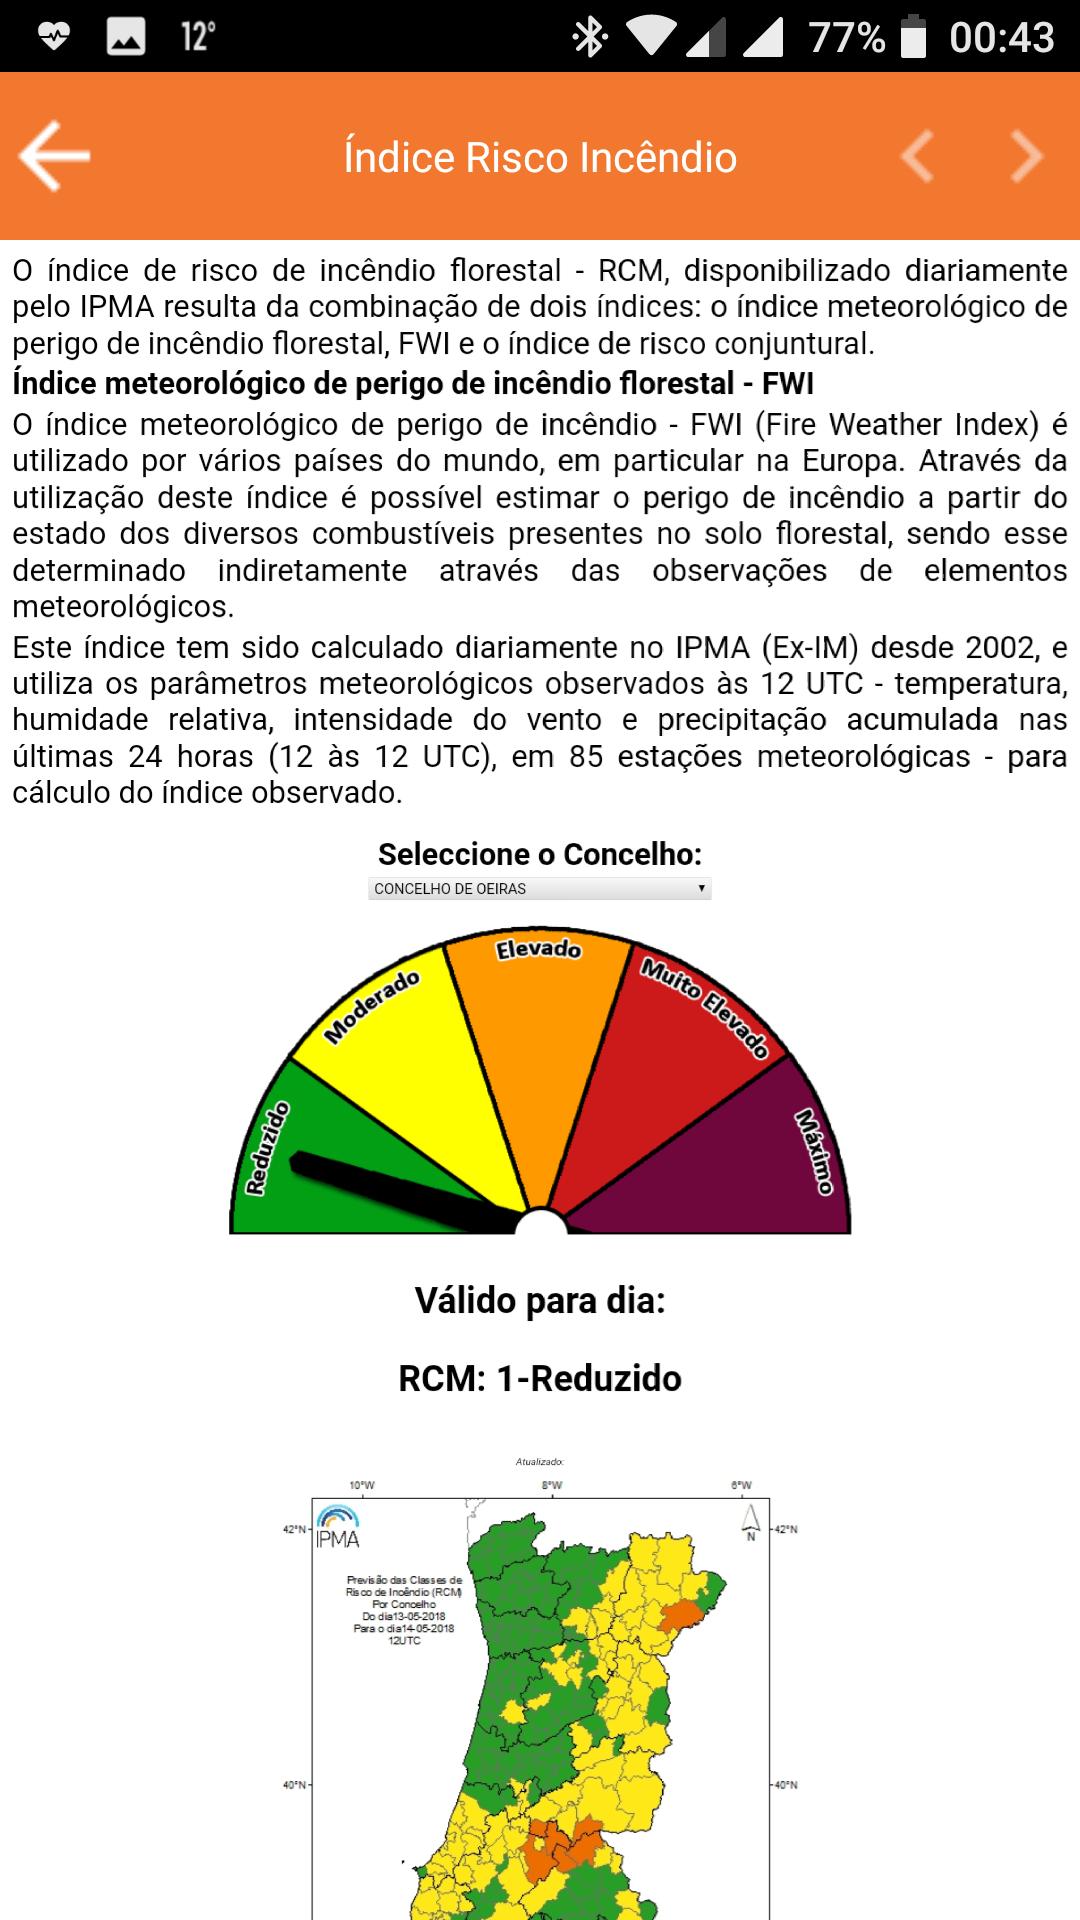 app_bvpacodearcos_20201030 (41)